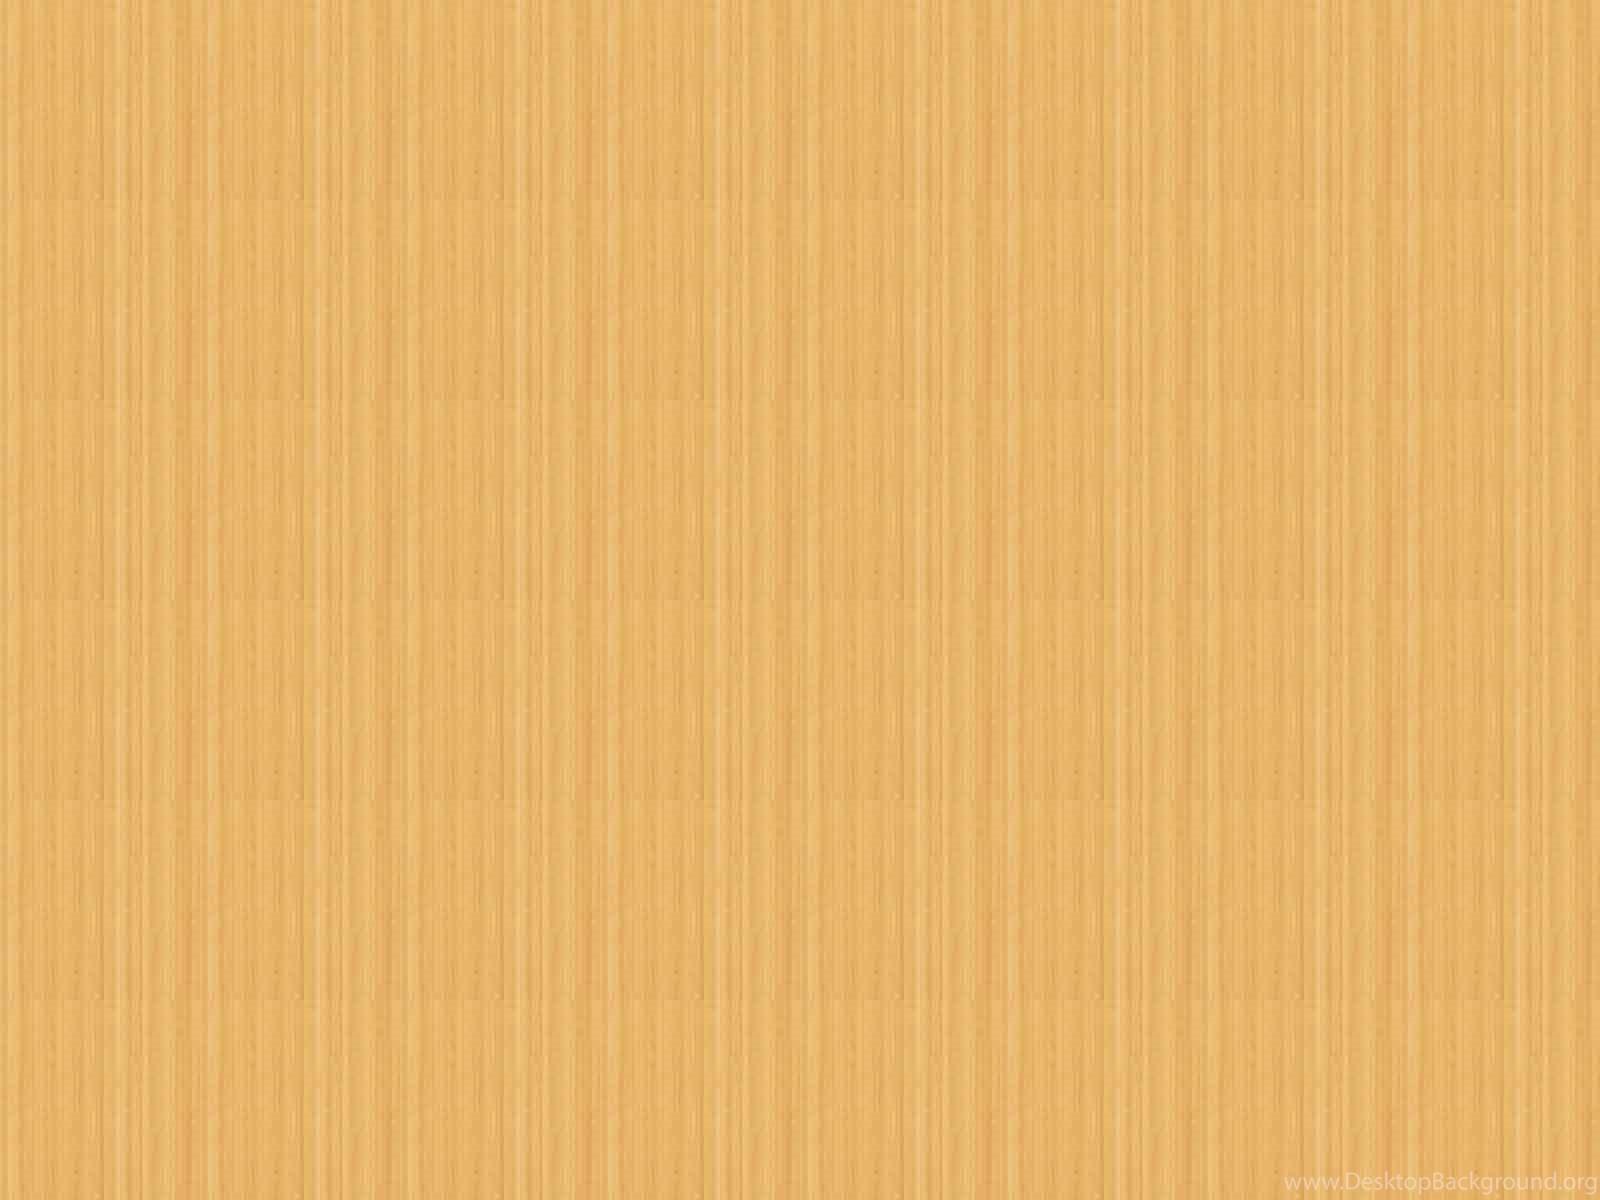 Bamboo Texture Seamless HDpict Desktop Background